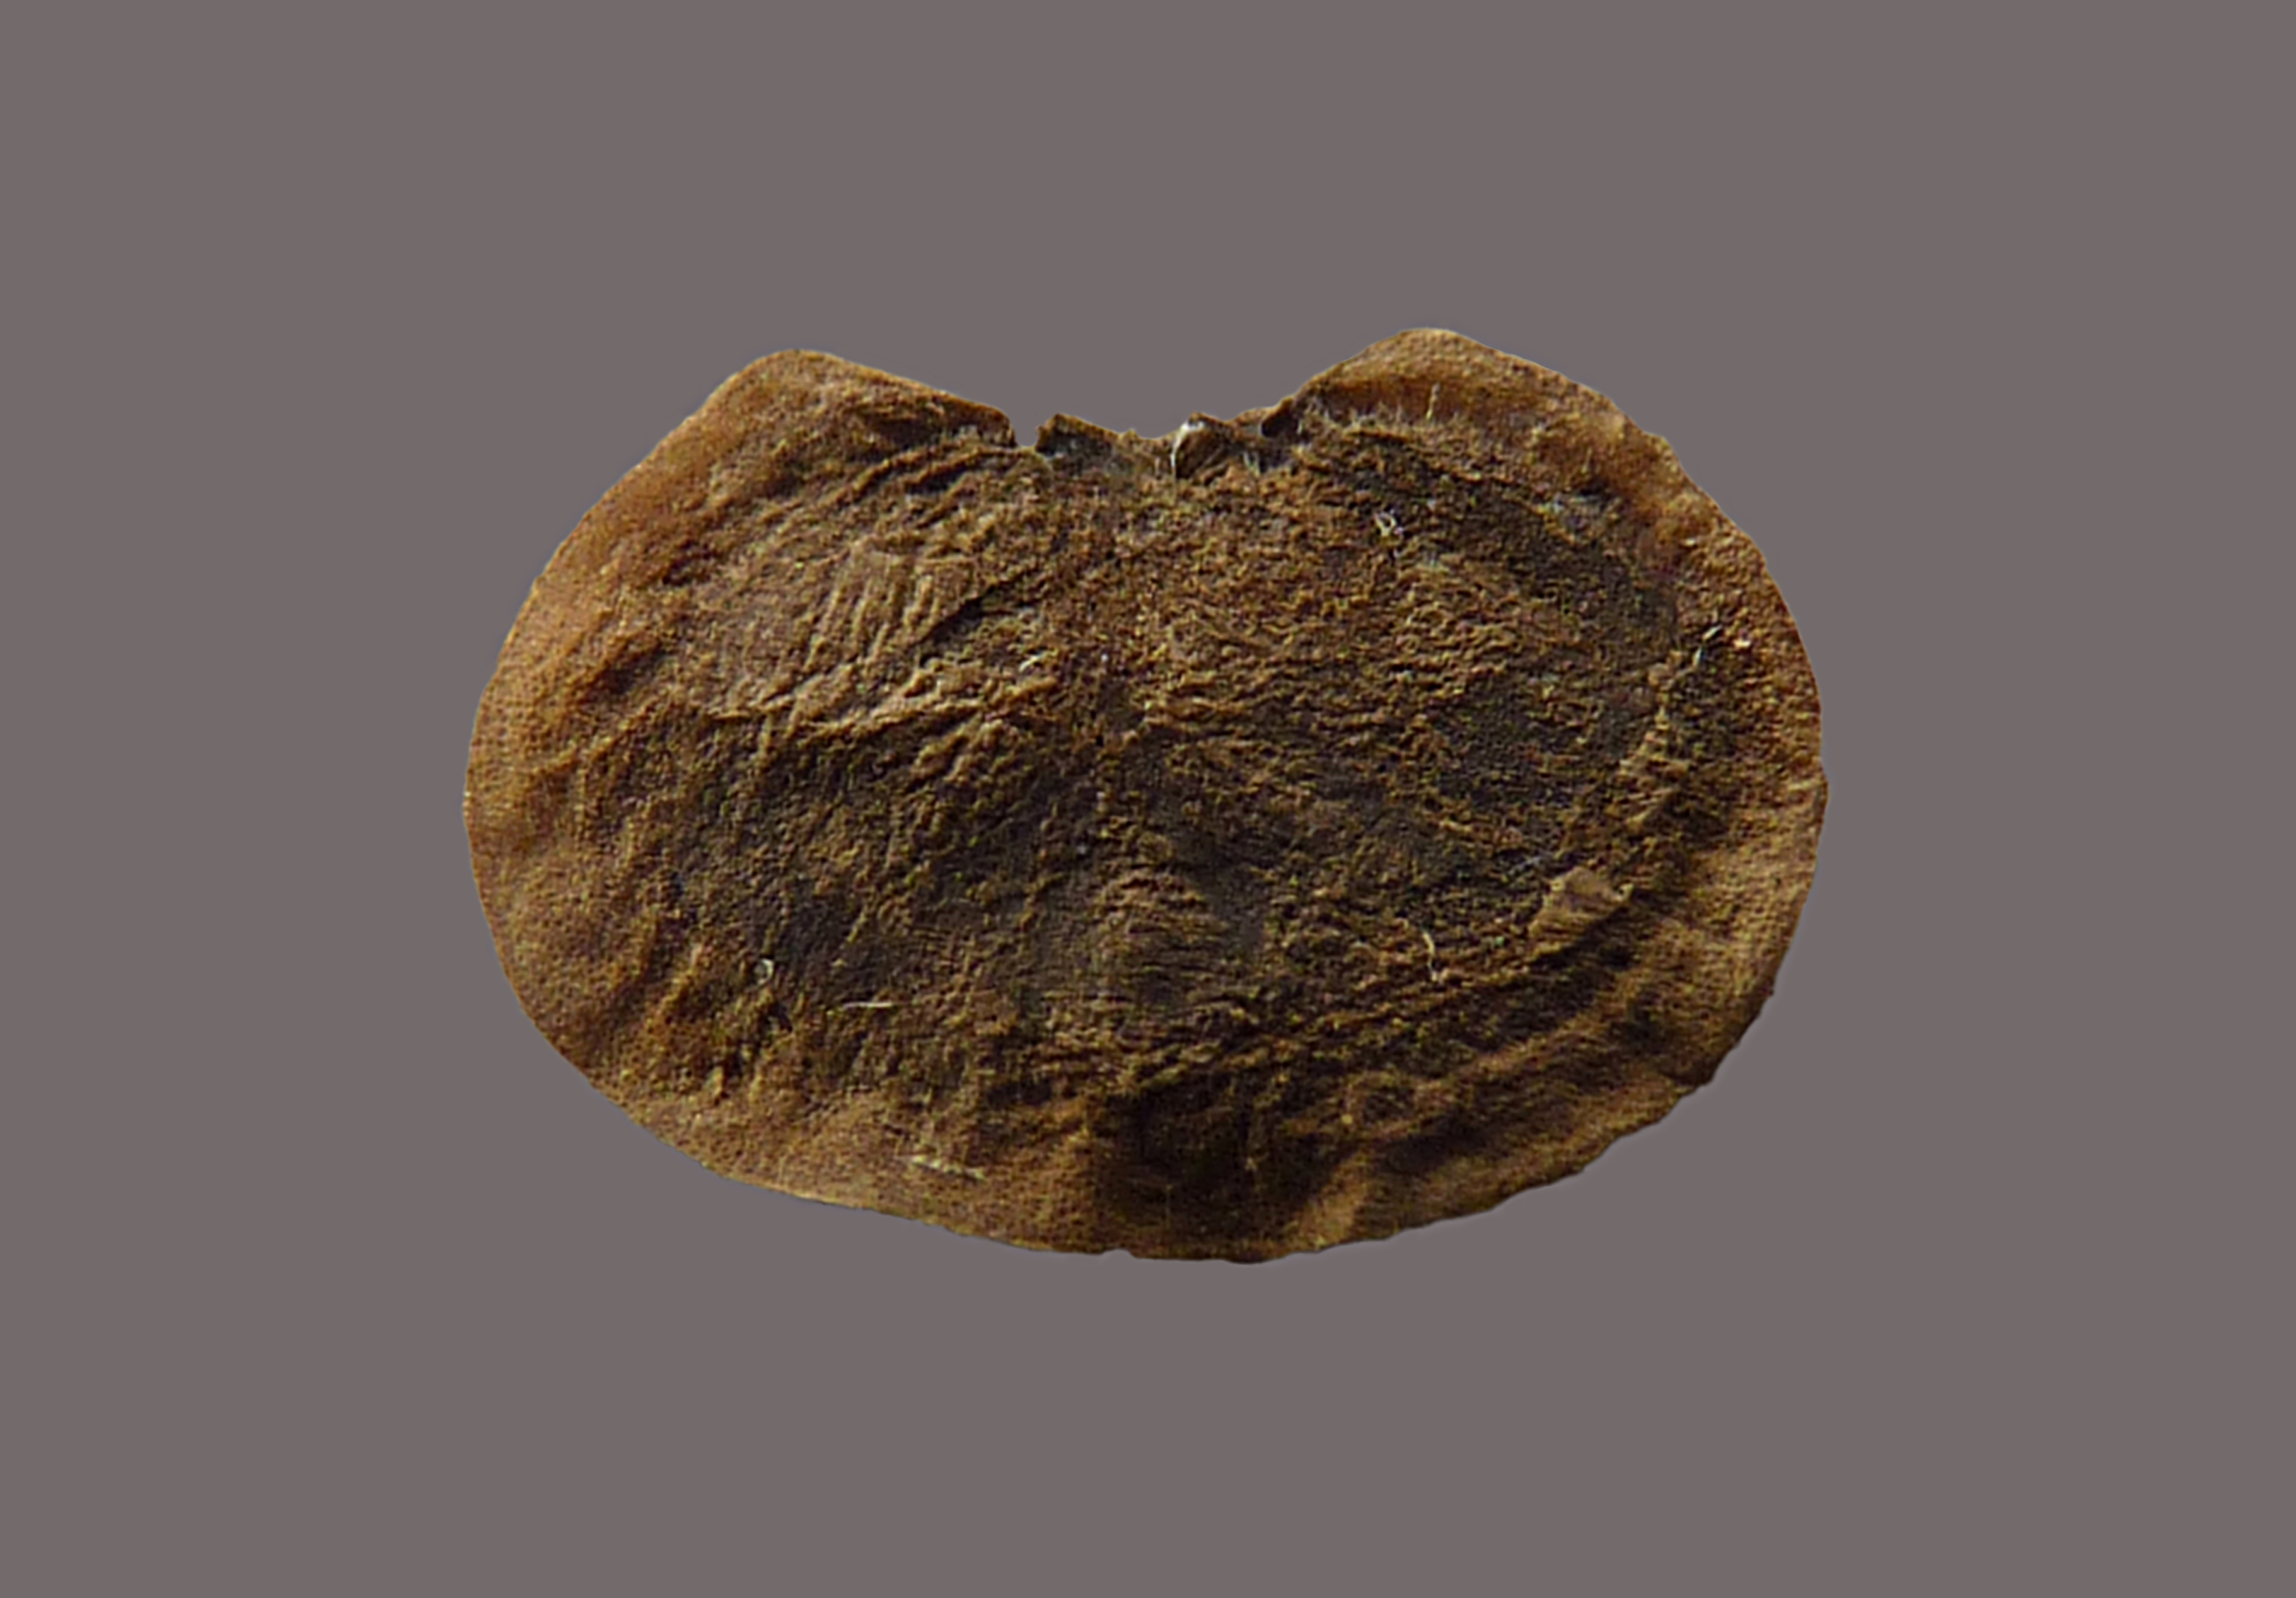 Annua Seeds File:lunaria Annua Seed J1.jpg